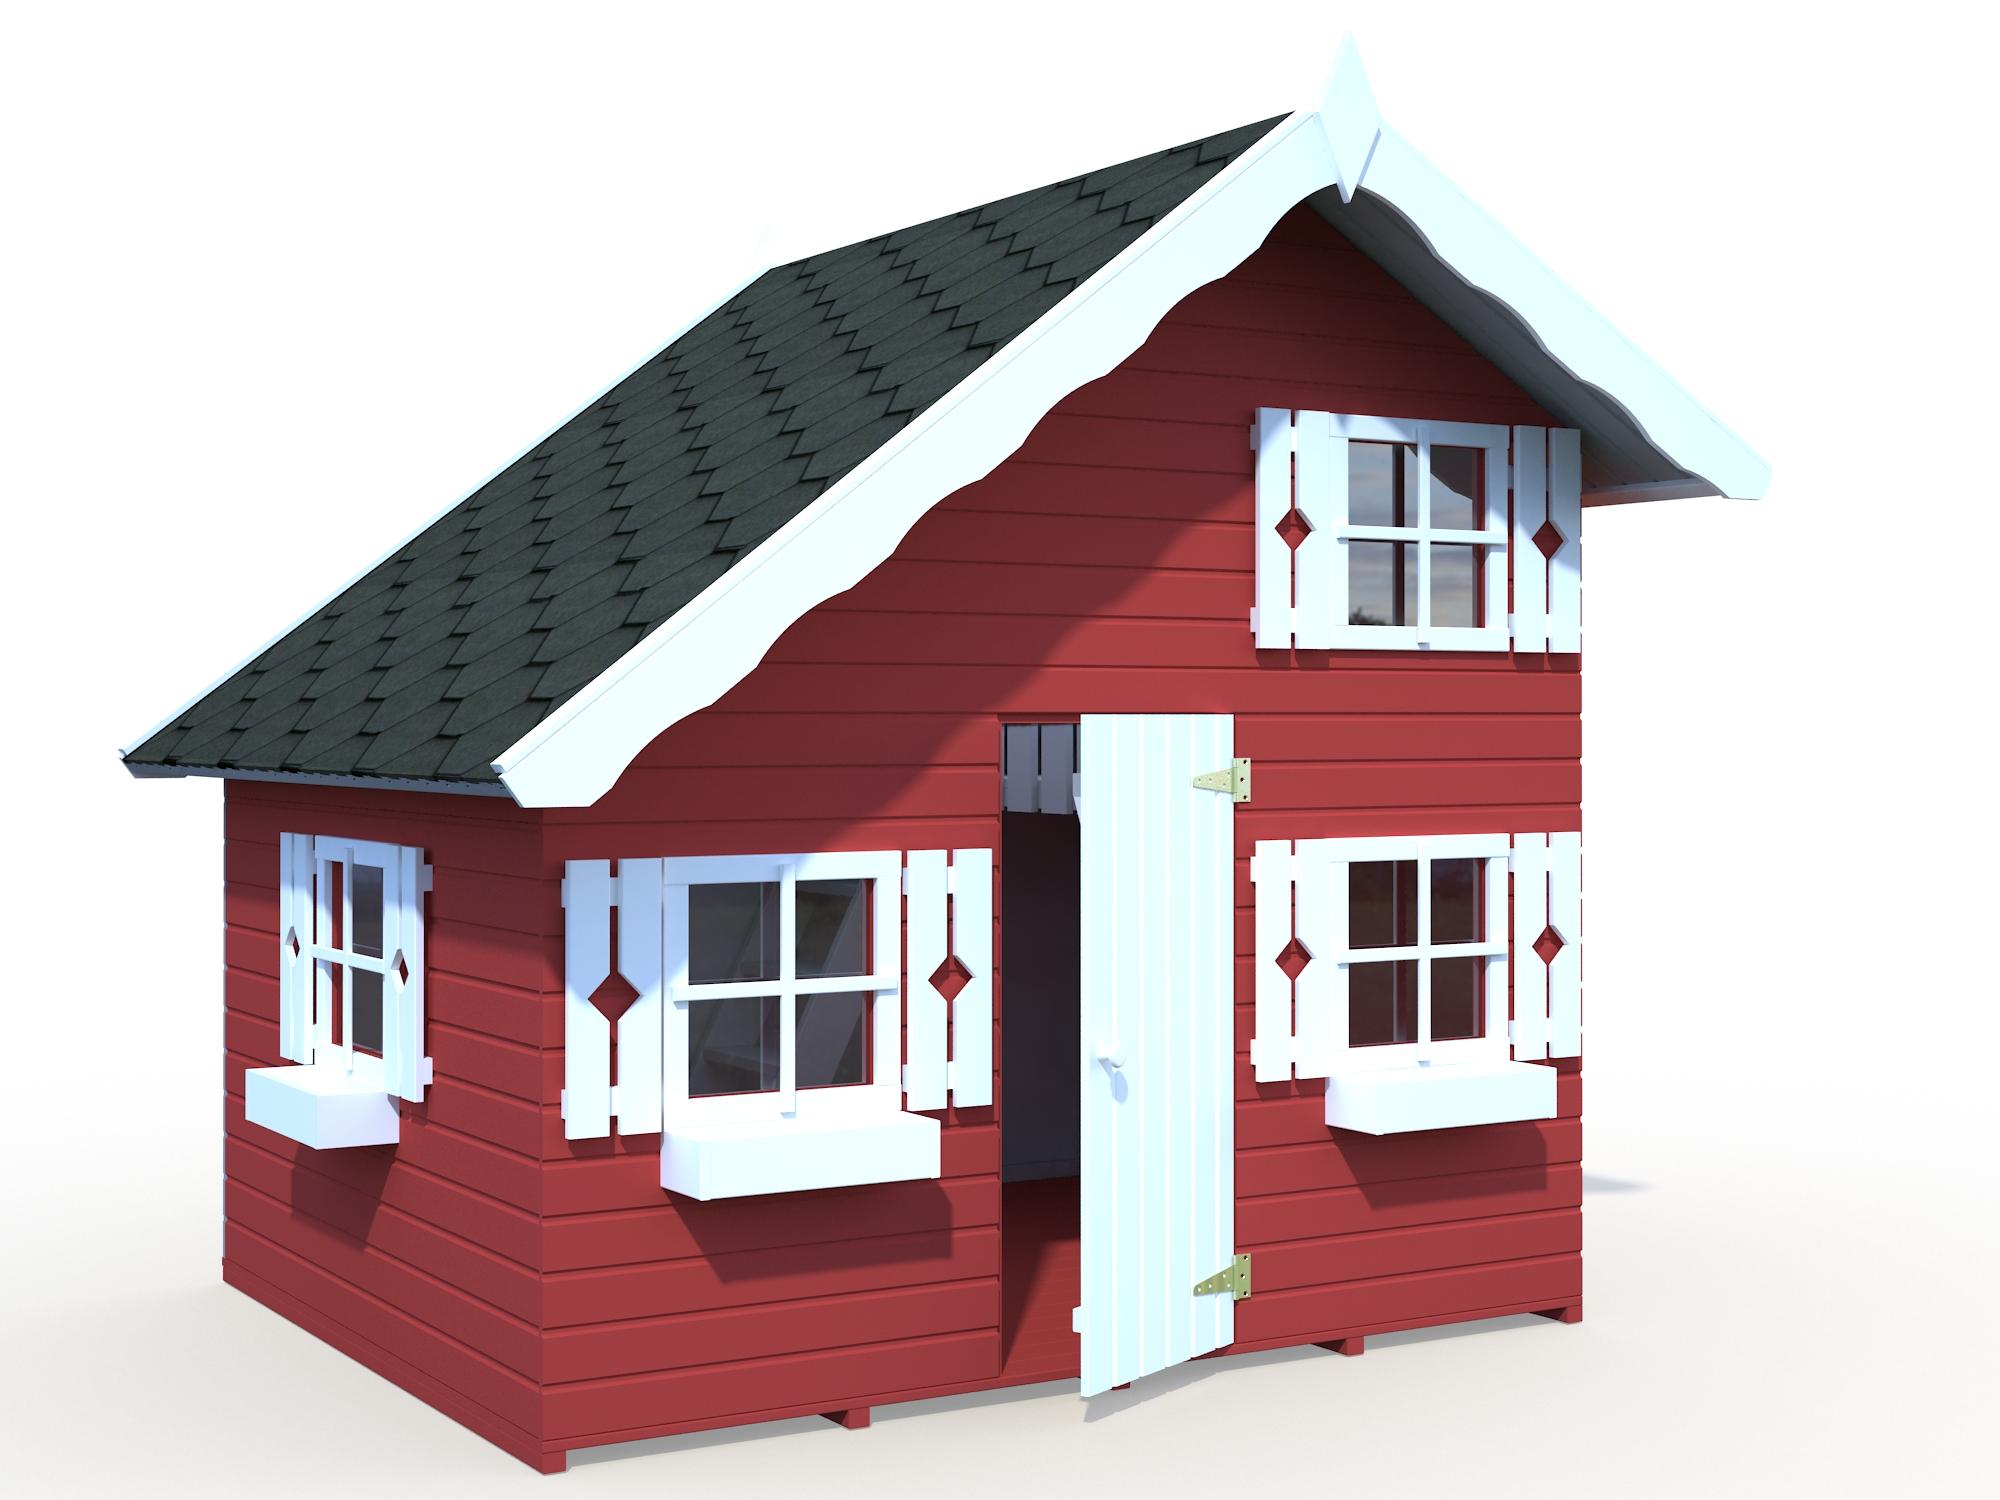 palmako kinderspielhaus tom b220 x t180 x h228 cm spielhaus kinderhaus holzhaus claudia. Black Bedroom Furniture Sets. Home Design Ideas